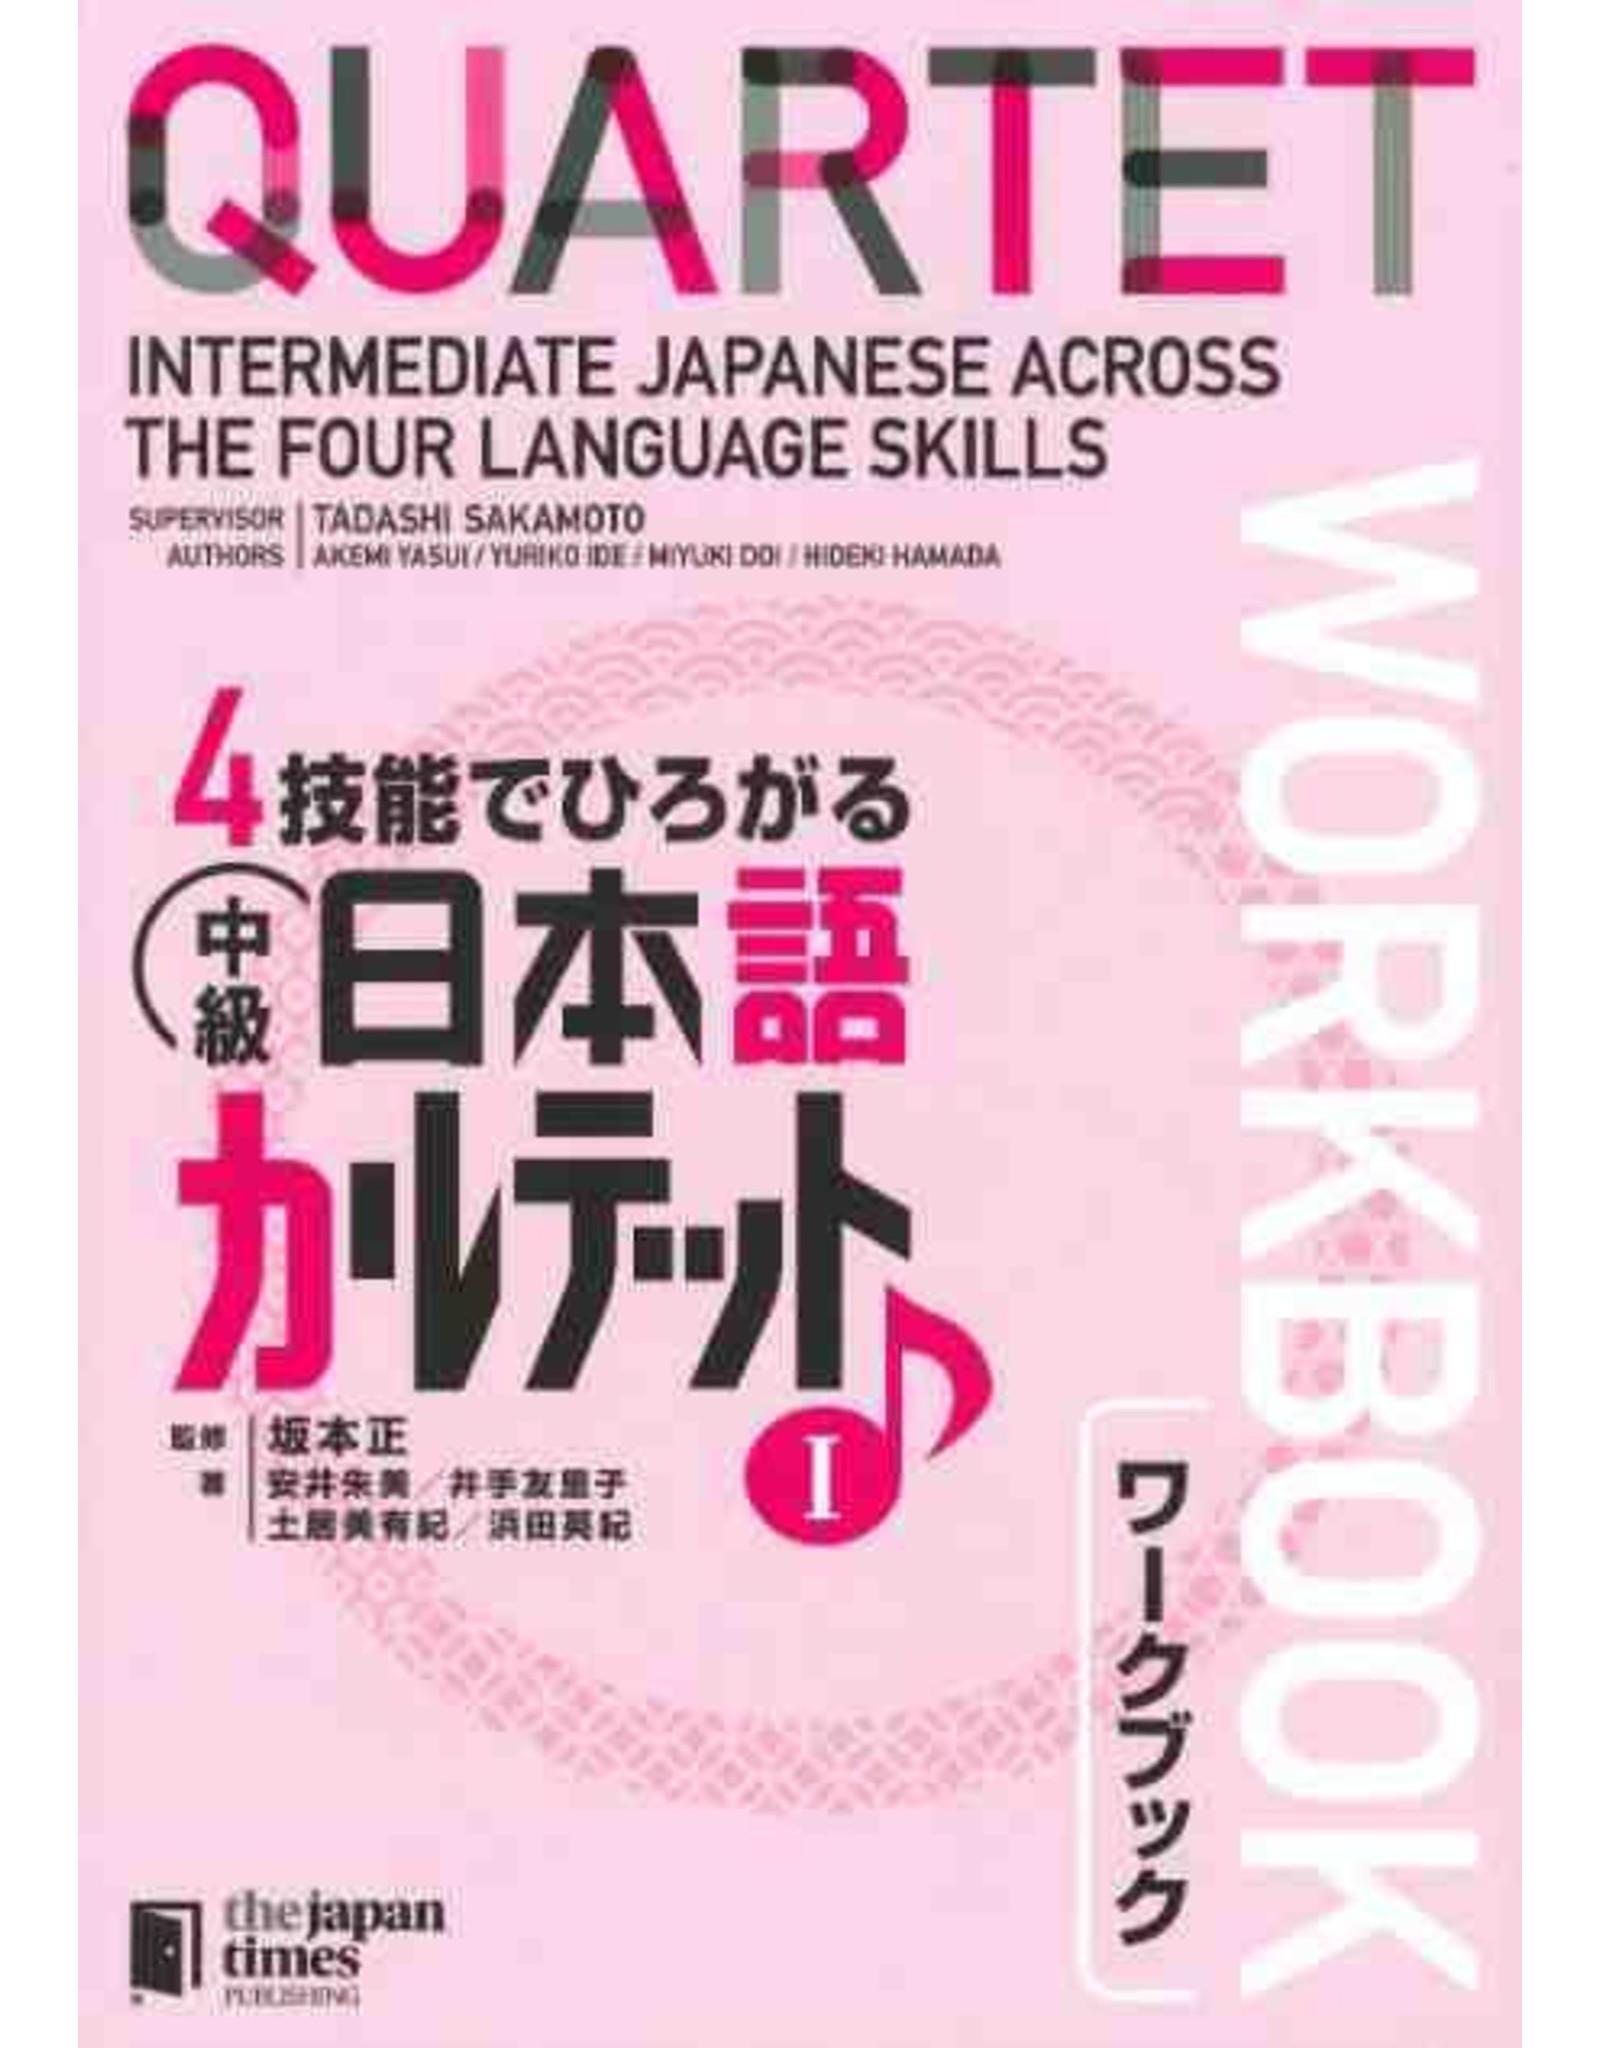 JAPAN TIMES QUARTET : INTERMEDIATE JAPANESE ACROSS THE FOUR LANGUAGE SKILLS WORKBOOK